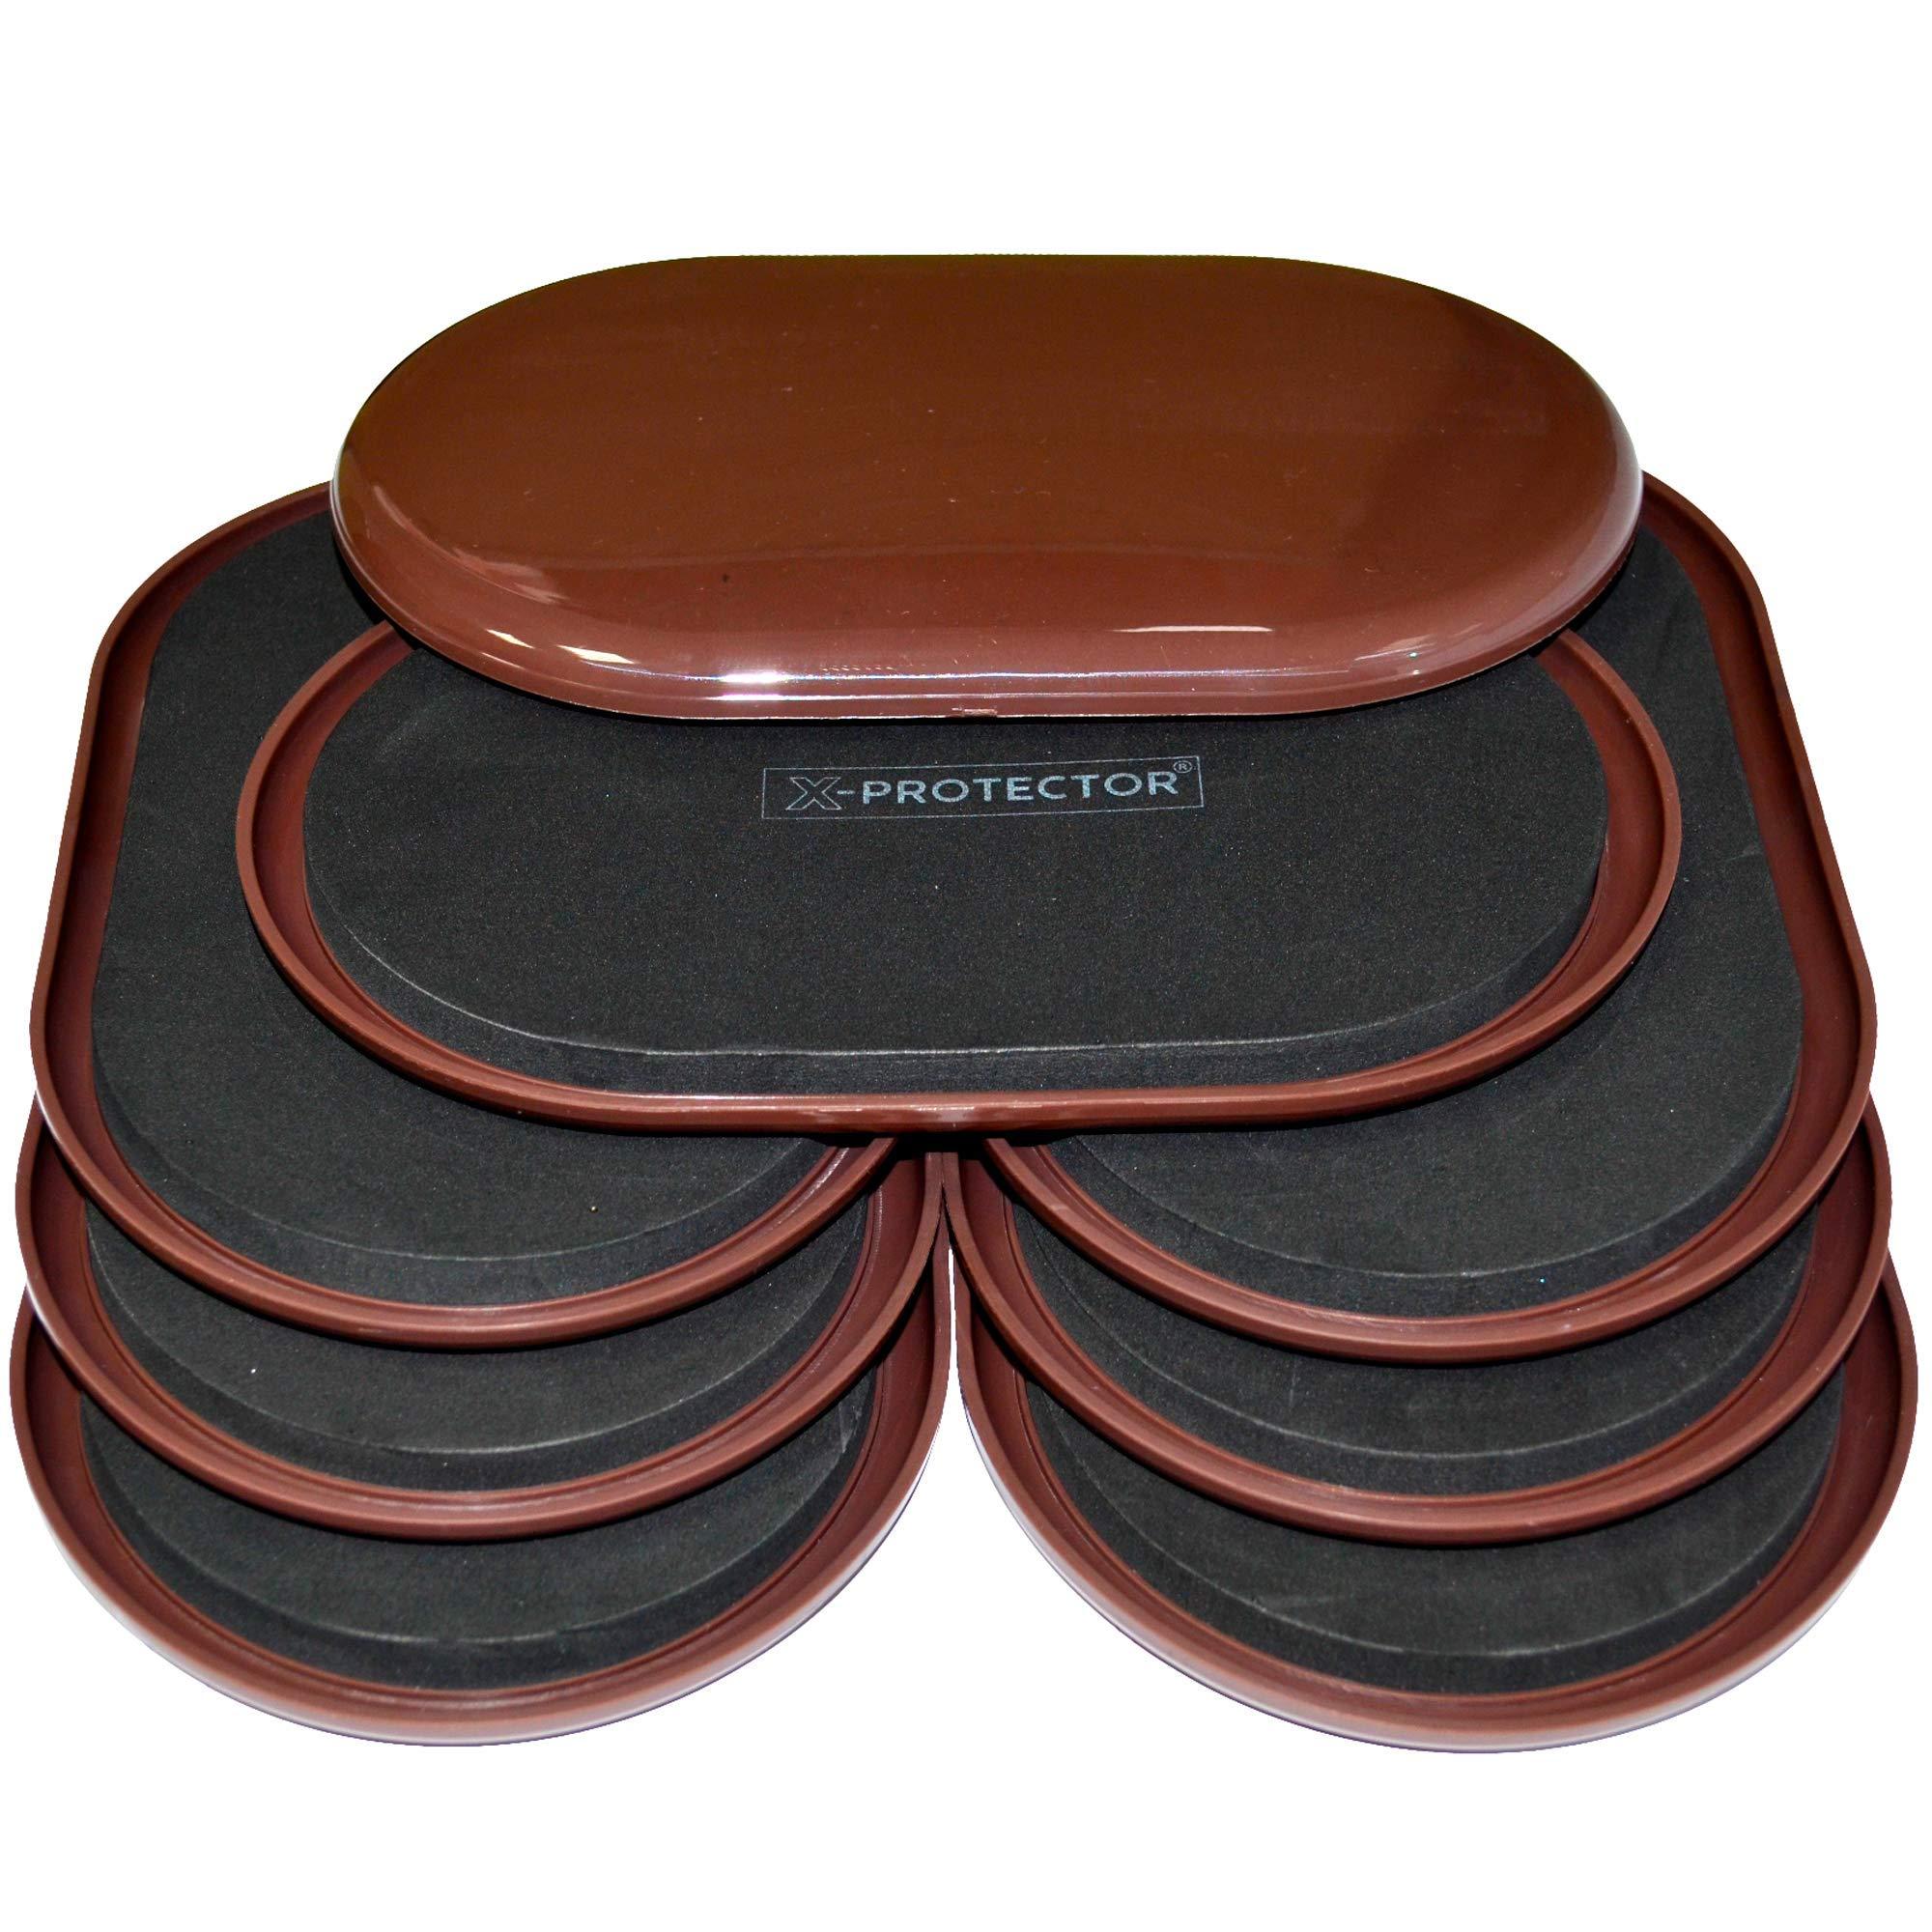 Furniture Sliders for Carpet X-Protector – 8 pcs Heavy Duty 9-1/2'' x 5-3/4'' Furniture Moving Pads - Sliders for Furniture. Move Your Furniture Easy with Reusable Furniture Movers Sliders for Carpets! by X-Protector